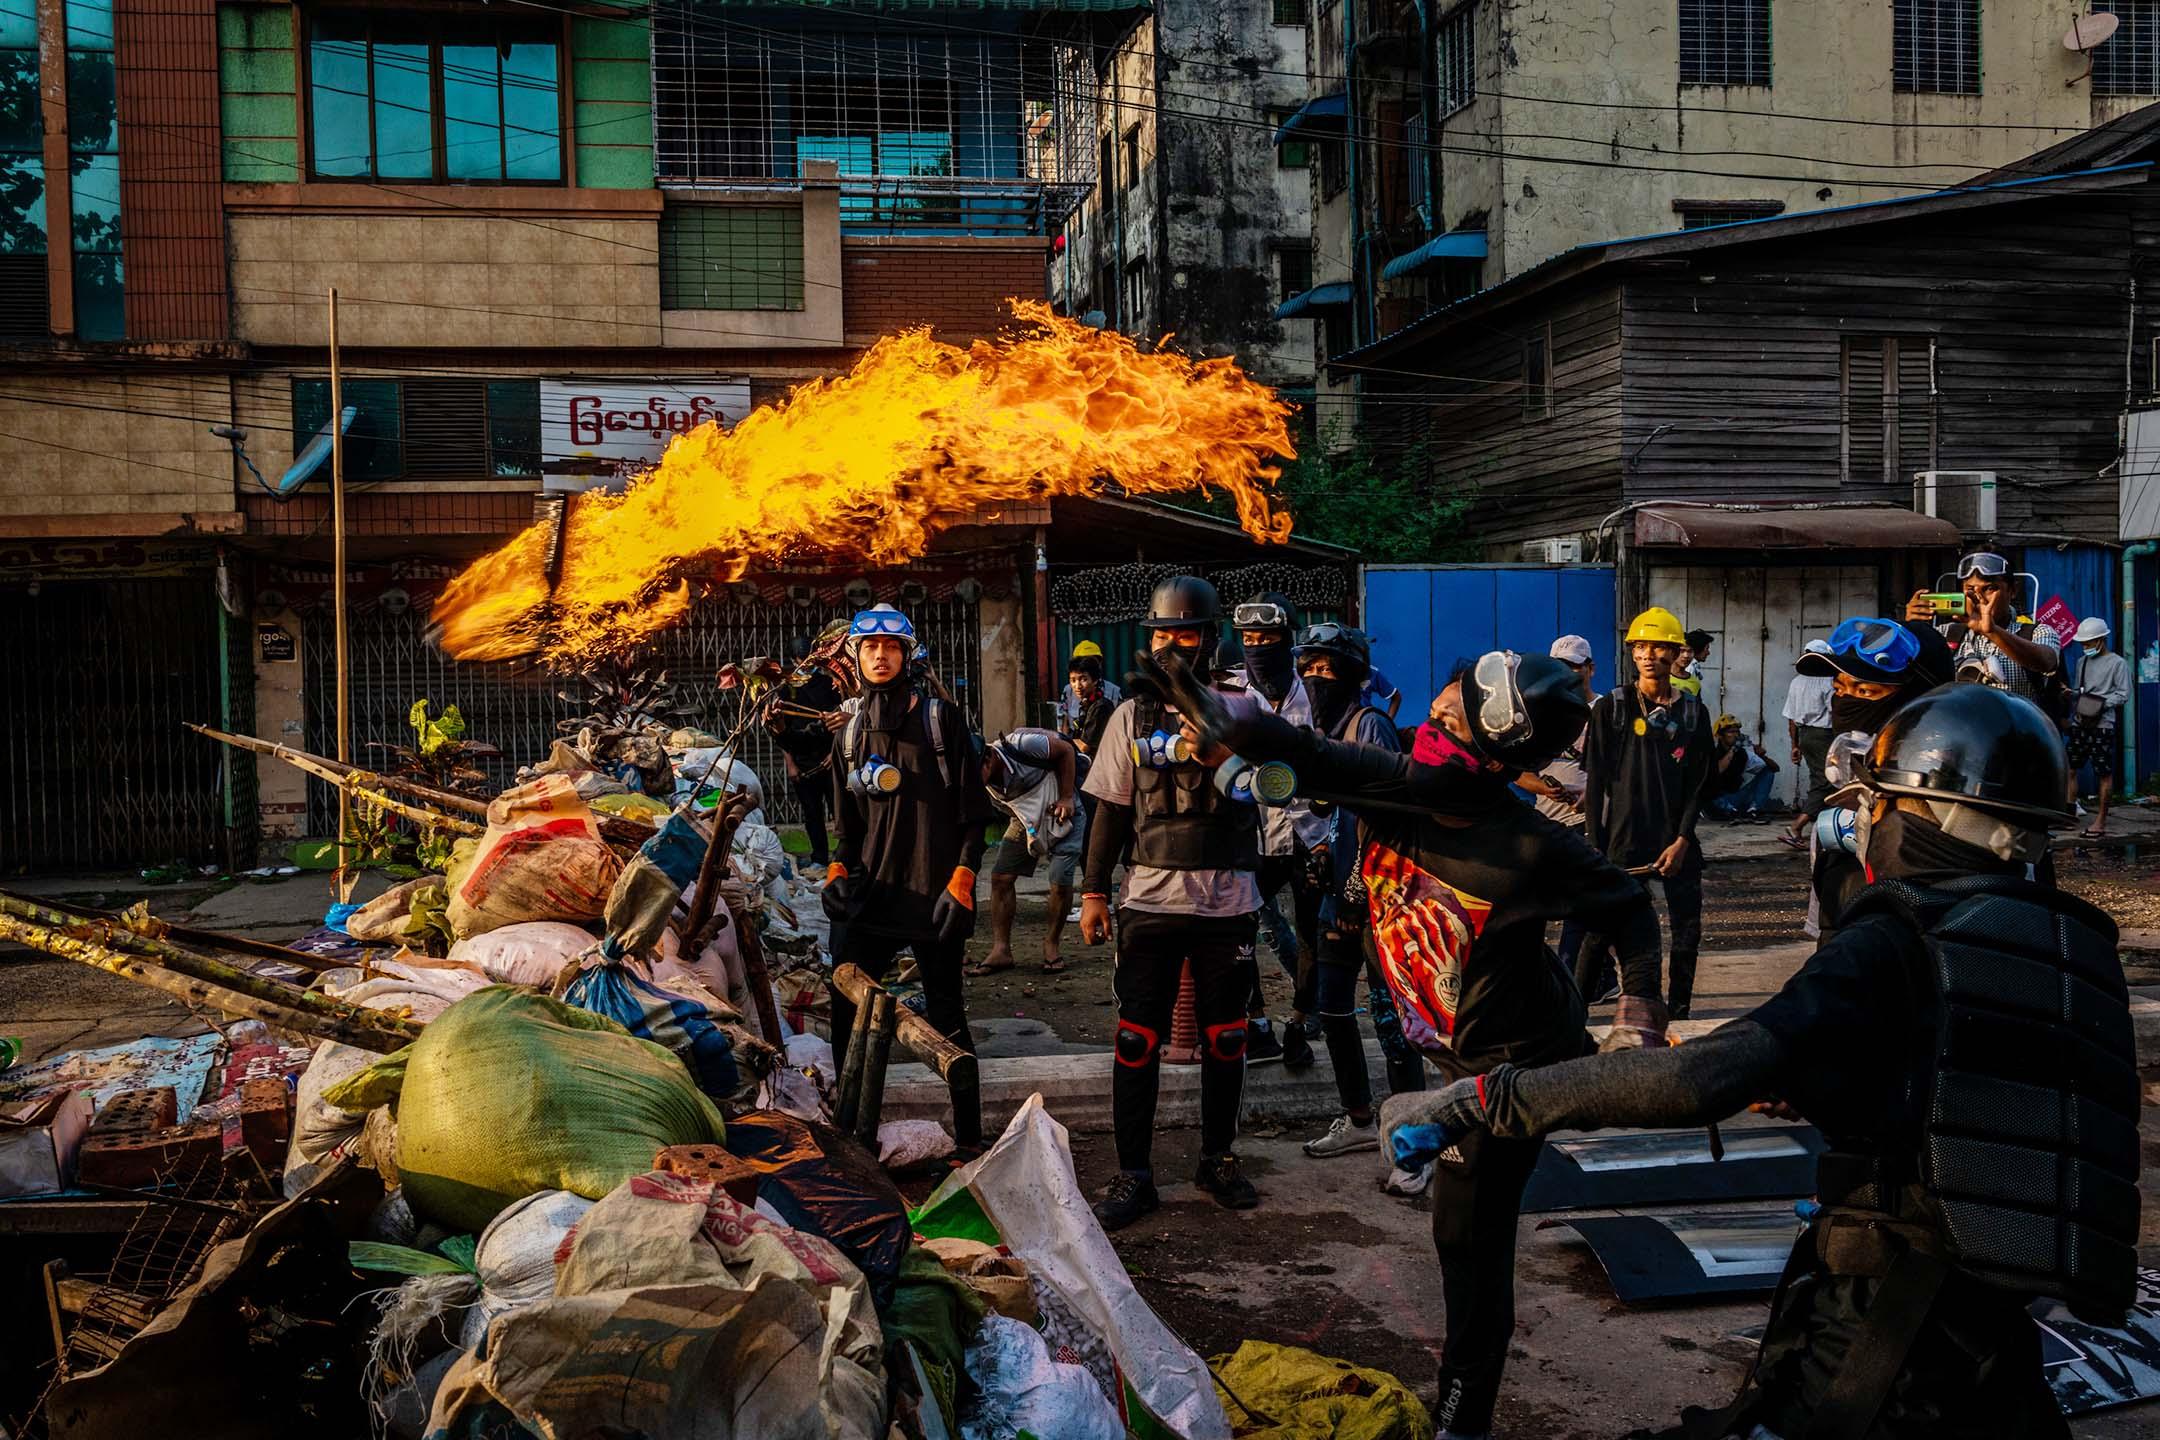 2021年3月16日緬甸仰光,示威者投拋汽油彈。 圖: Stringer/Getty Images